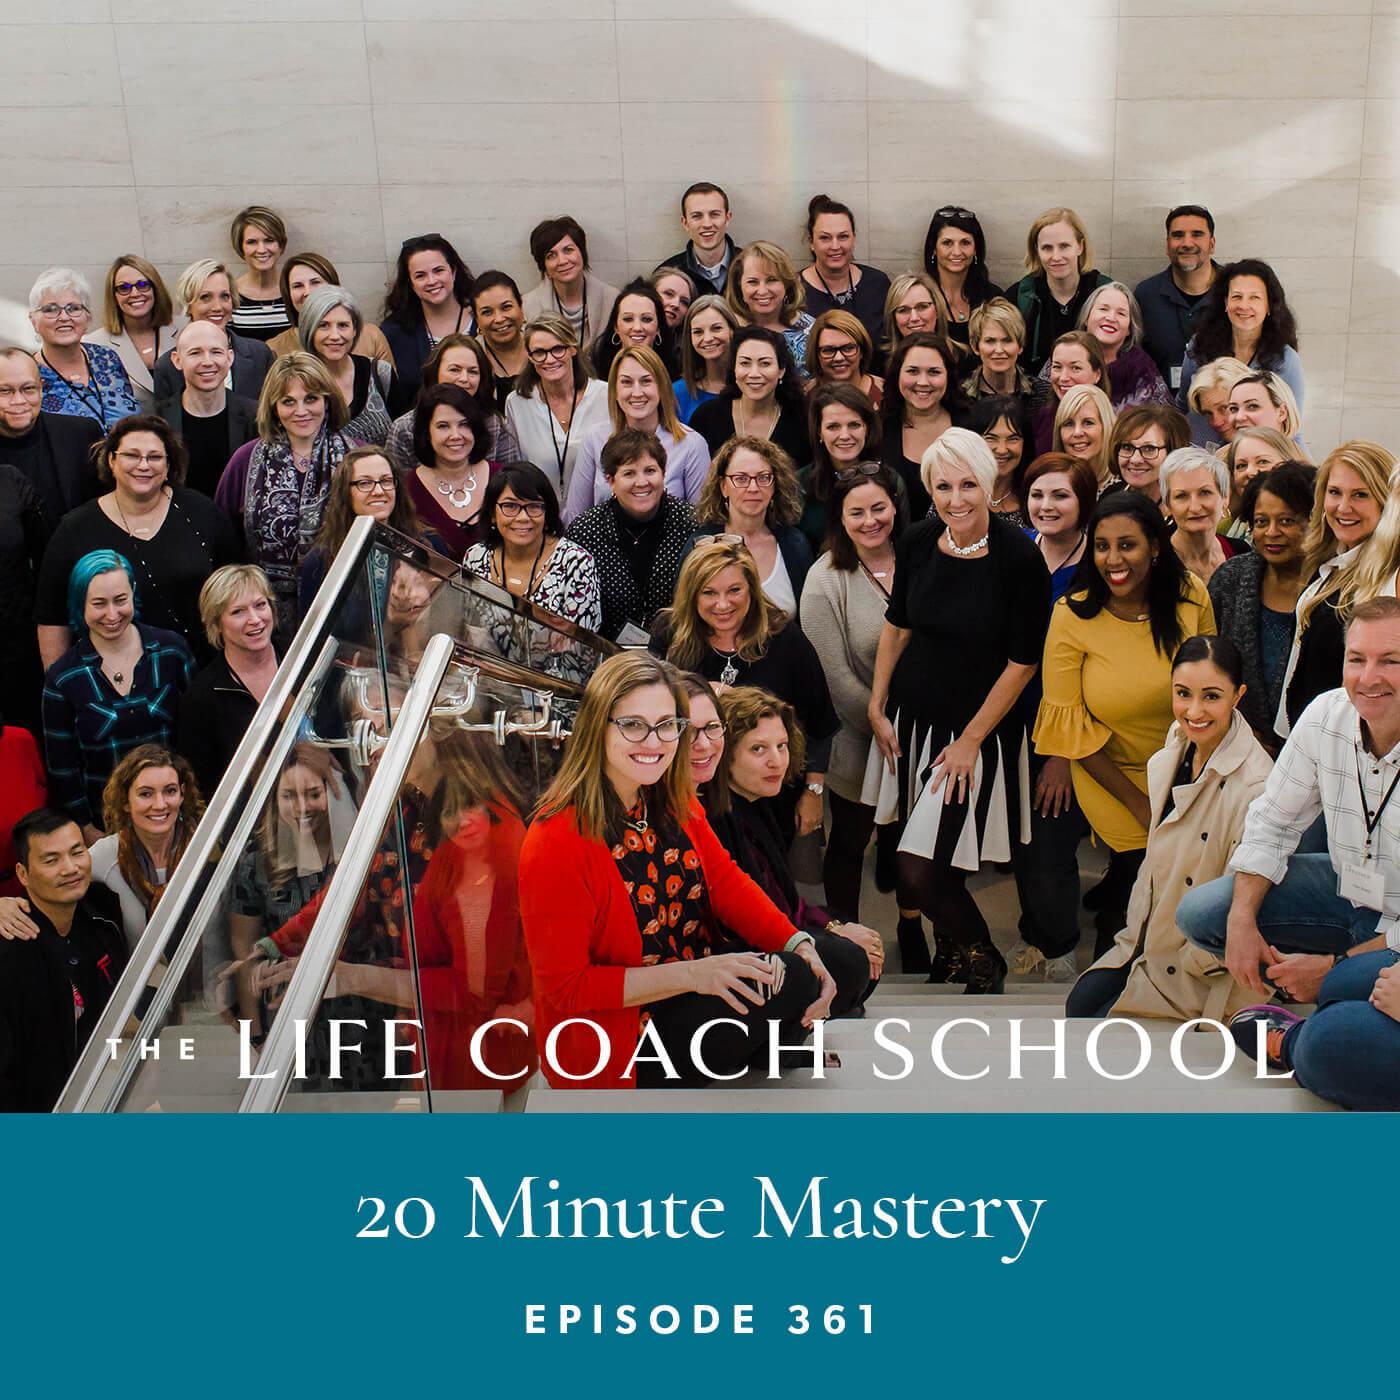 20 Minute Mastery